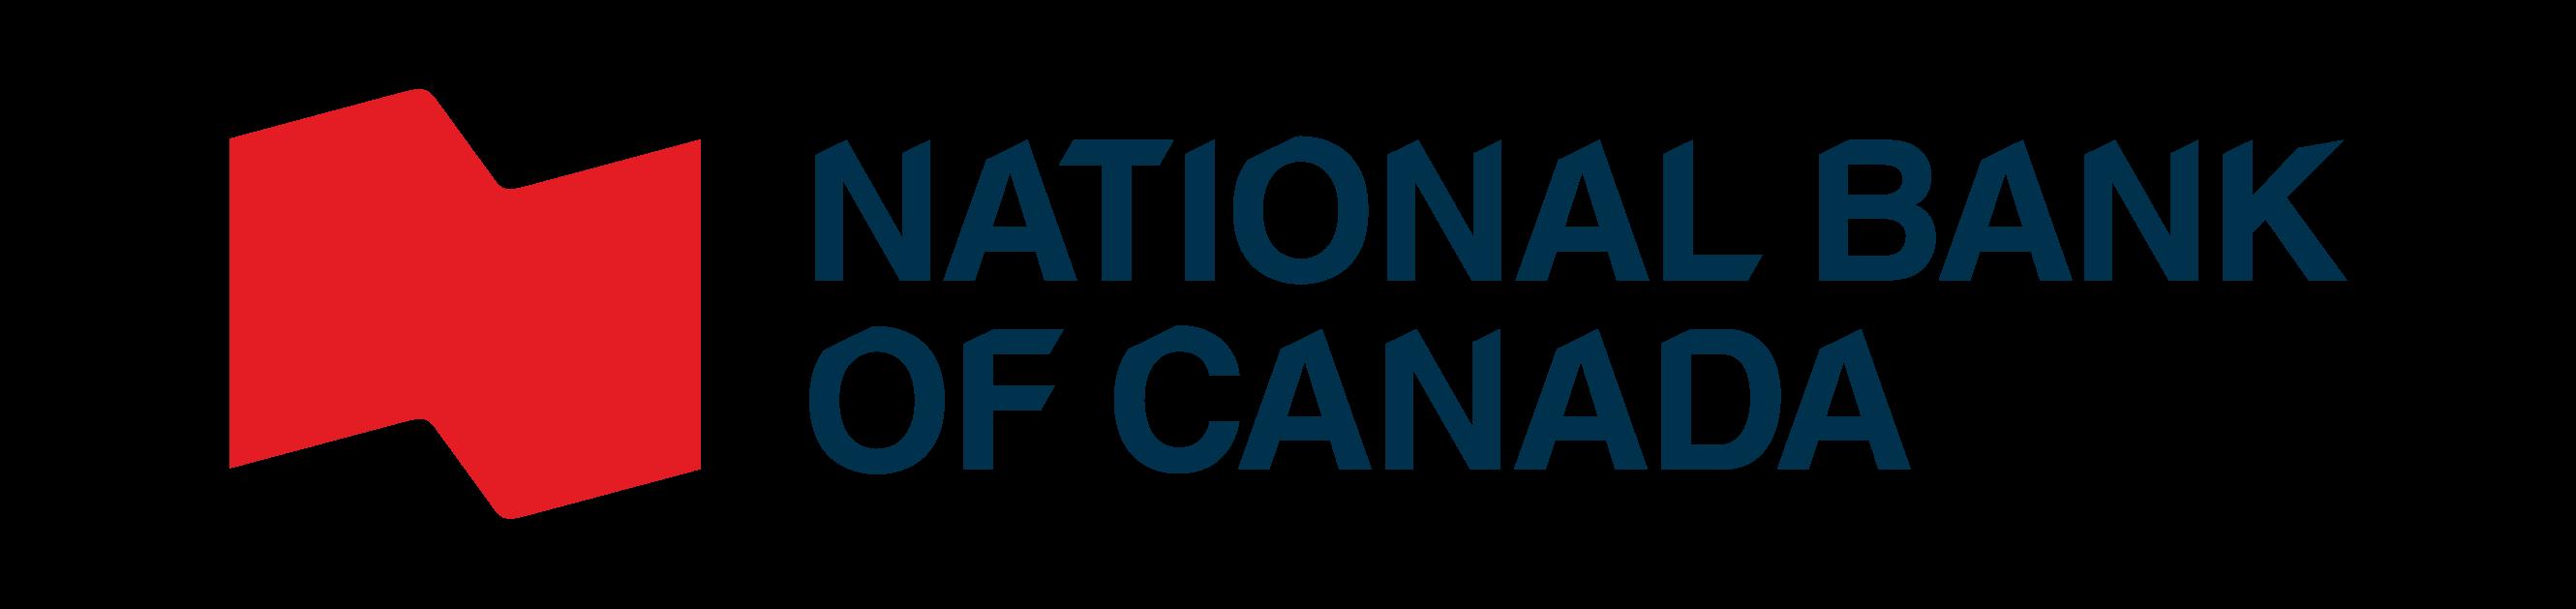 Логотип Национального банка Канады